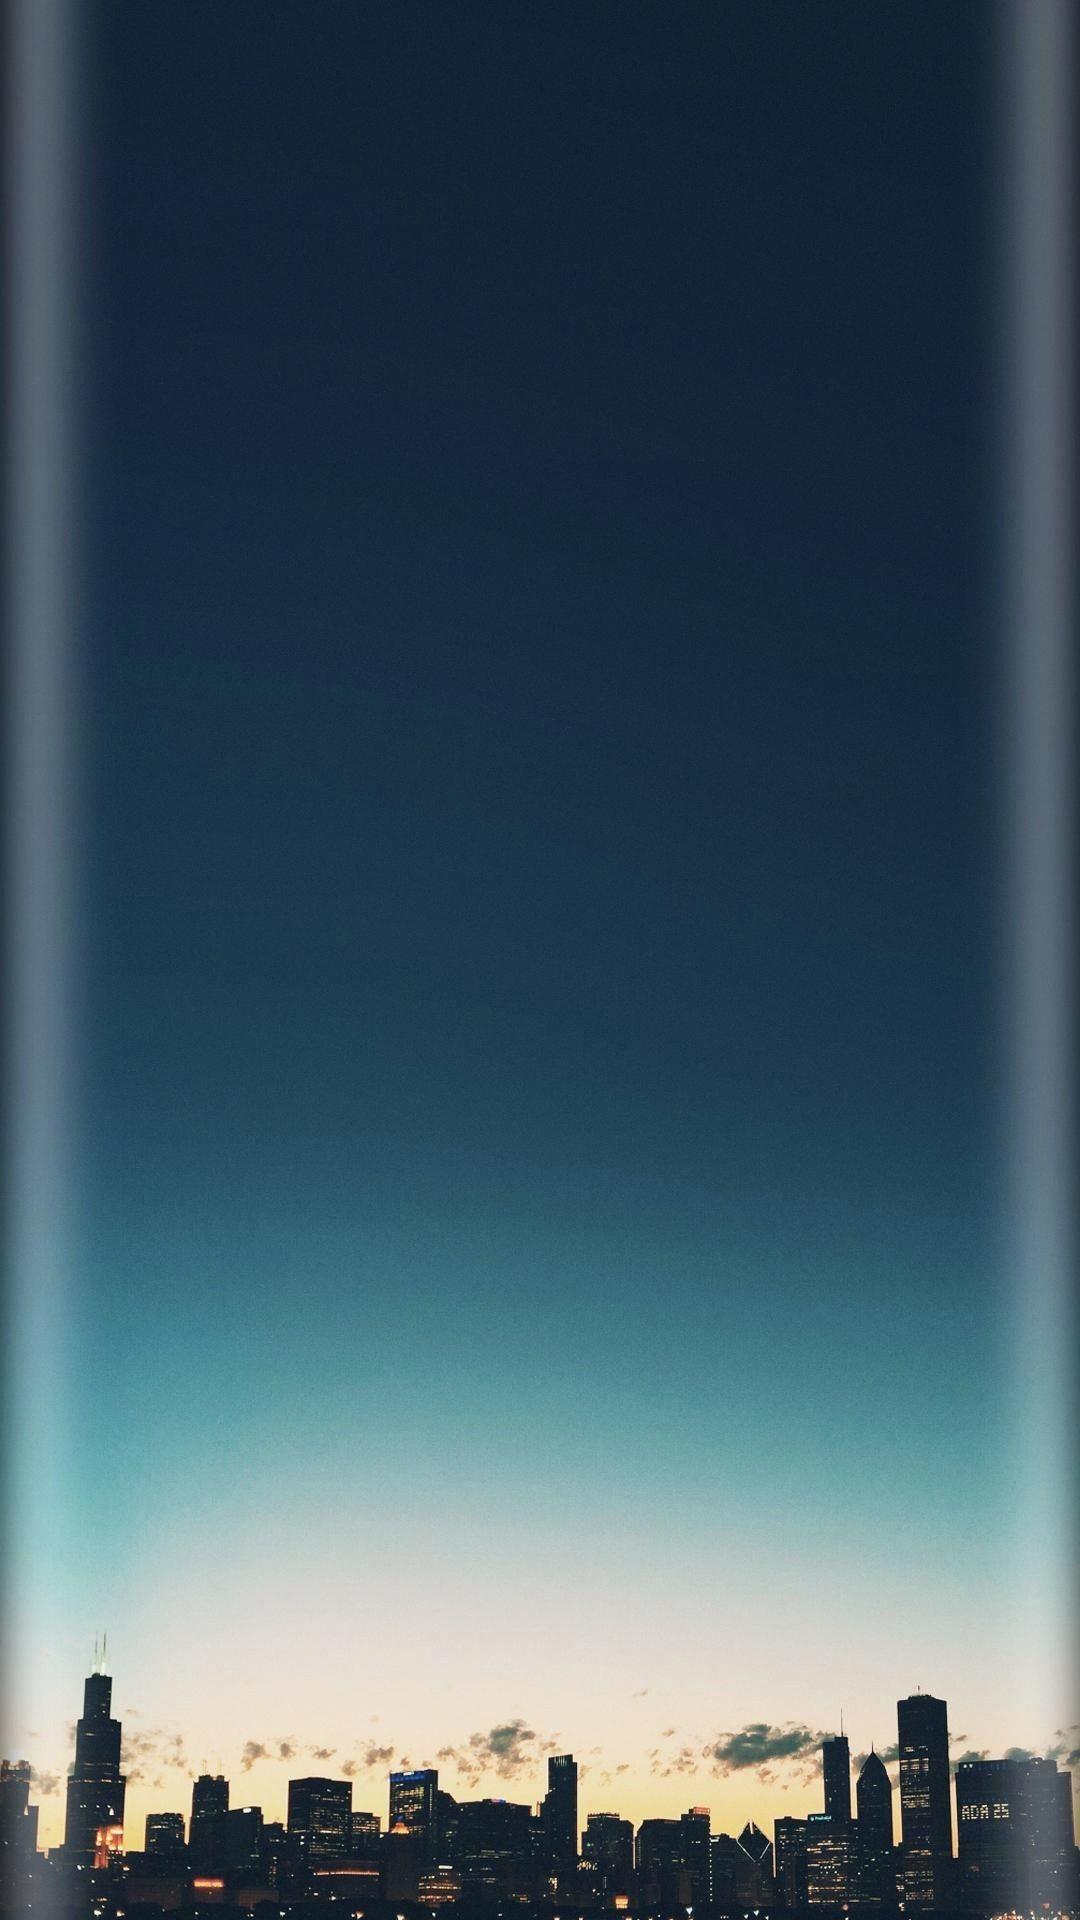 Free Wallpaper For Samsung S7 Edge